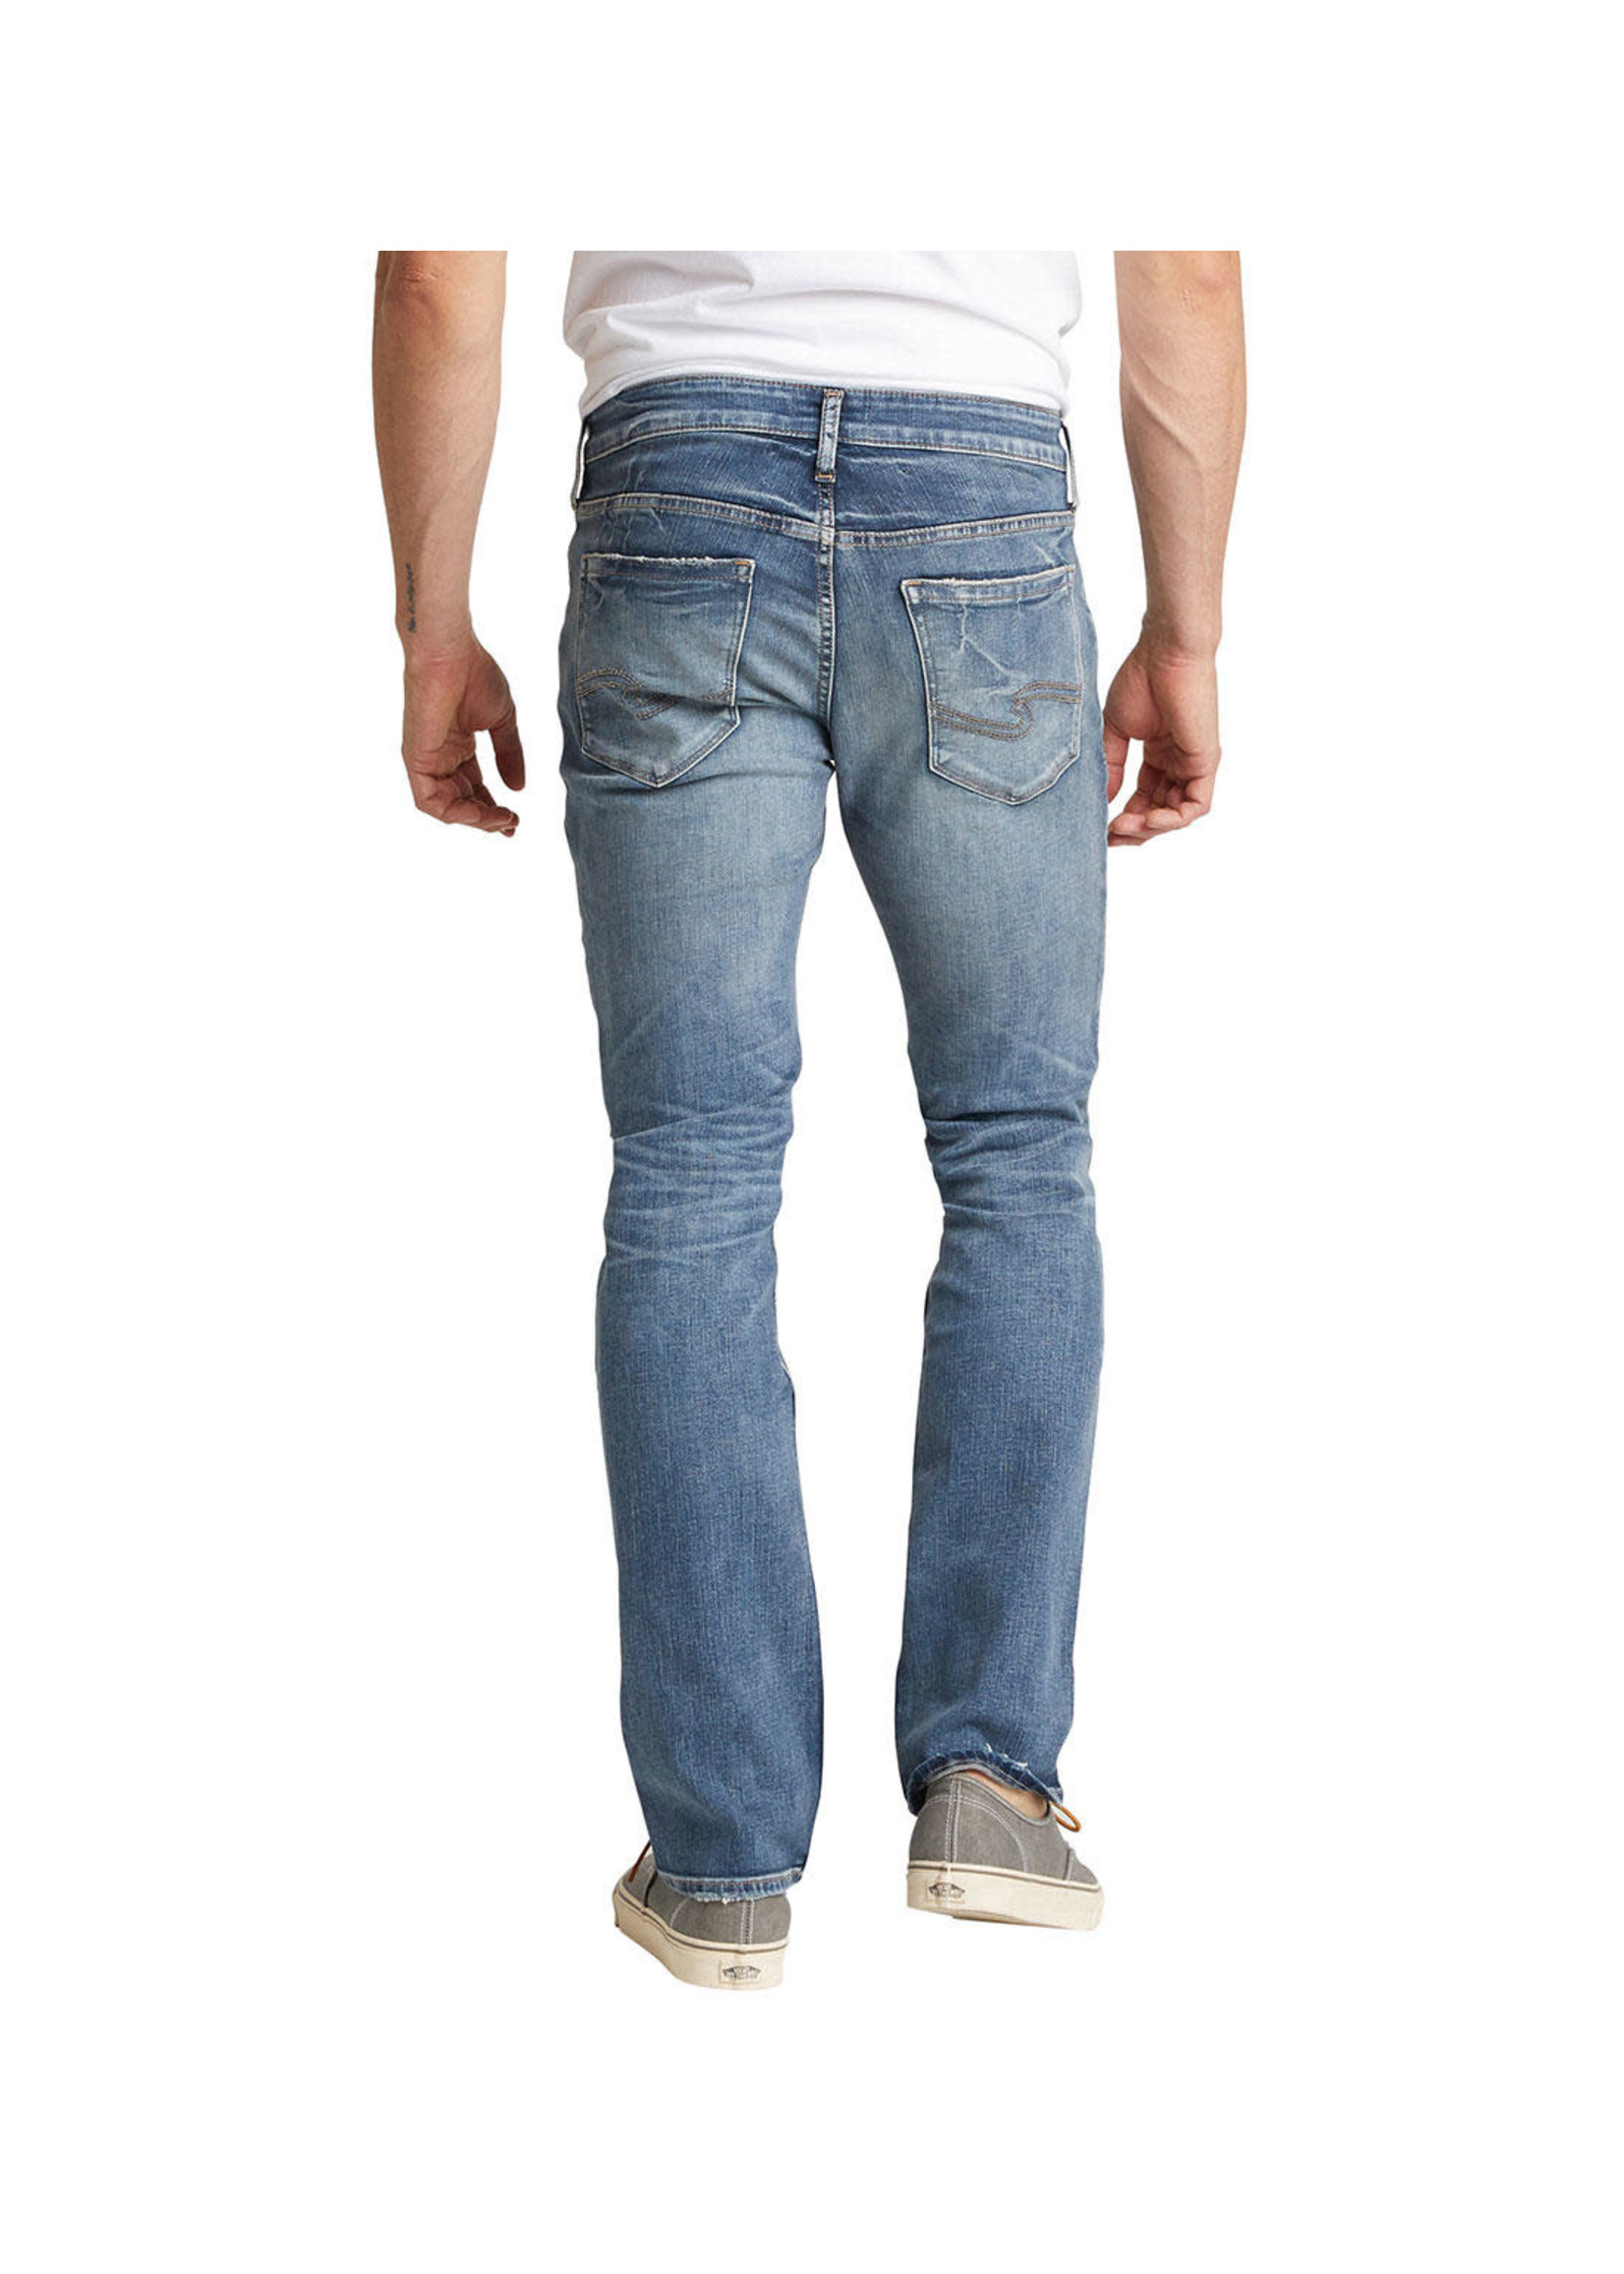 Silver Jeans Silver Jeans Co. - Konrad Slim Fit Slim Leg